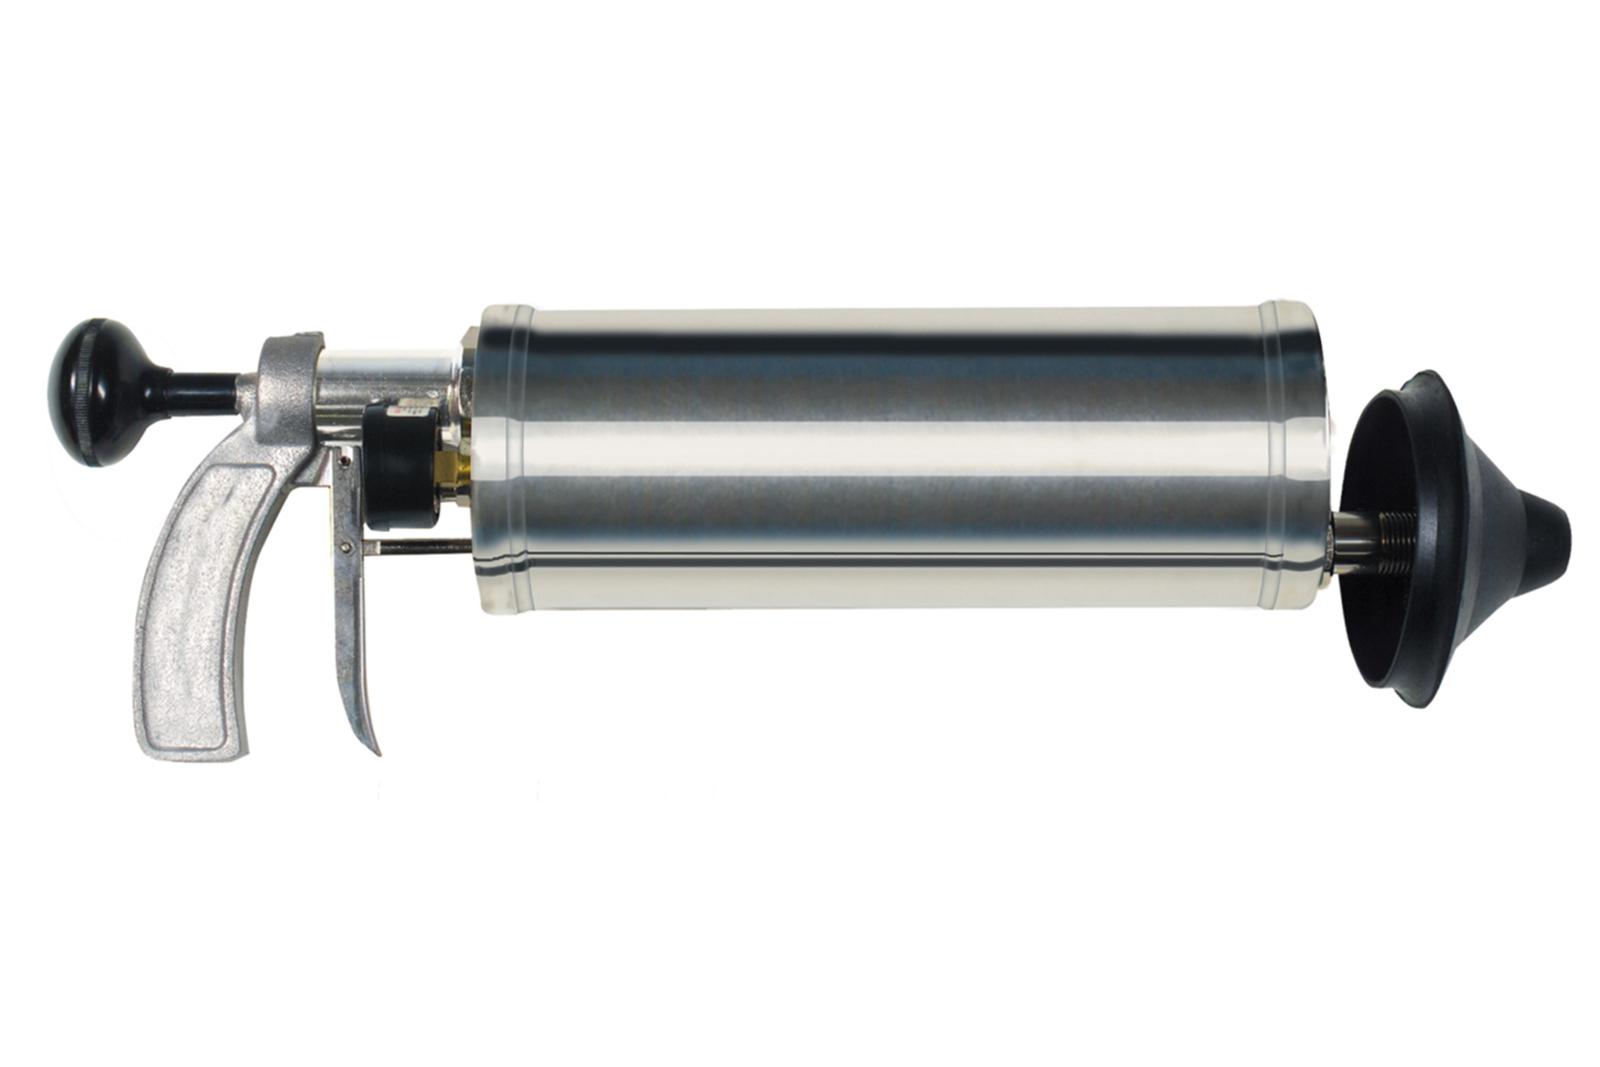 Пистолет промывочный General pipe Тайфун tns-a